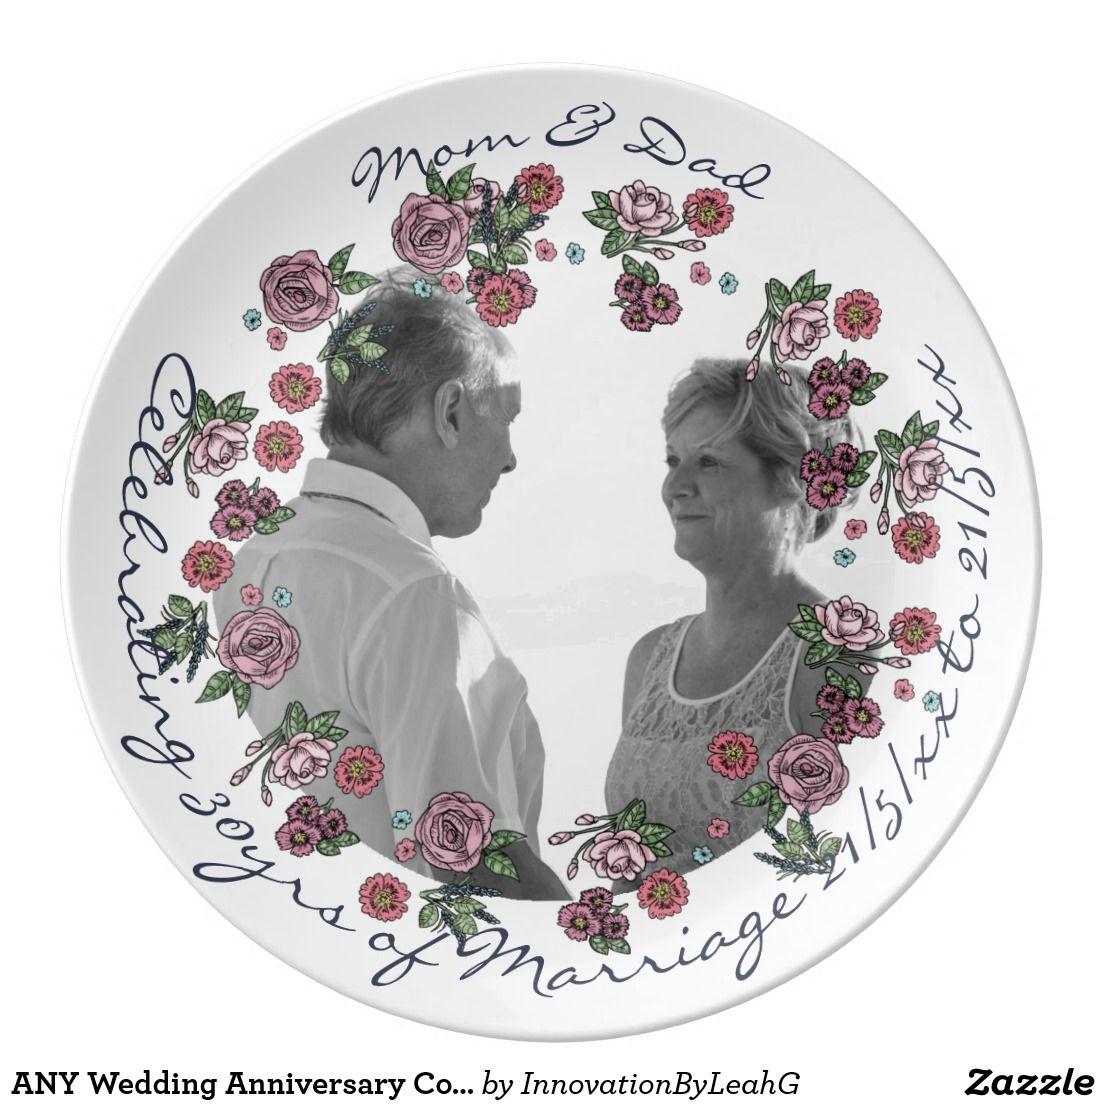 Any wedding anniversary commemorative dinner plate